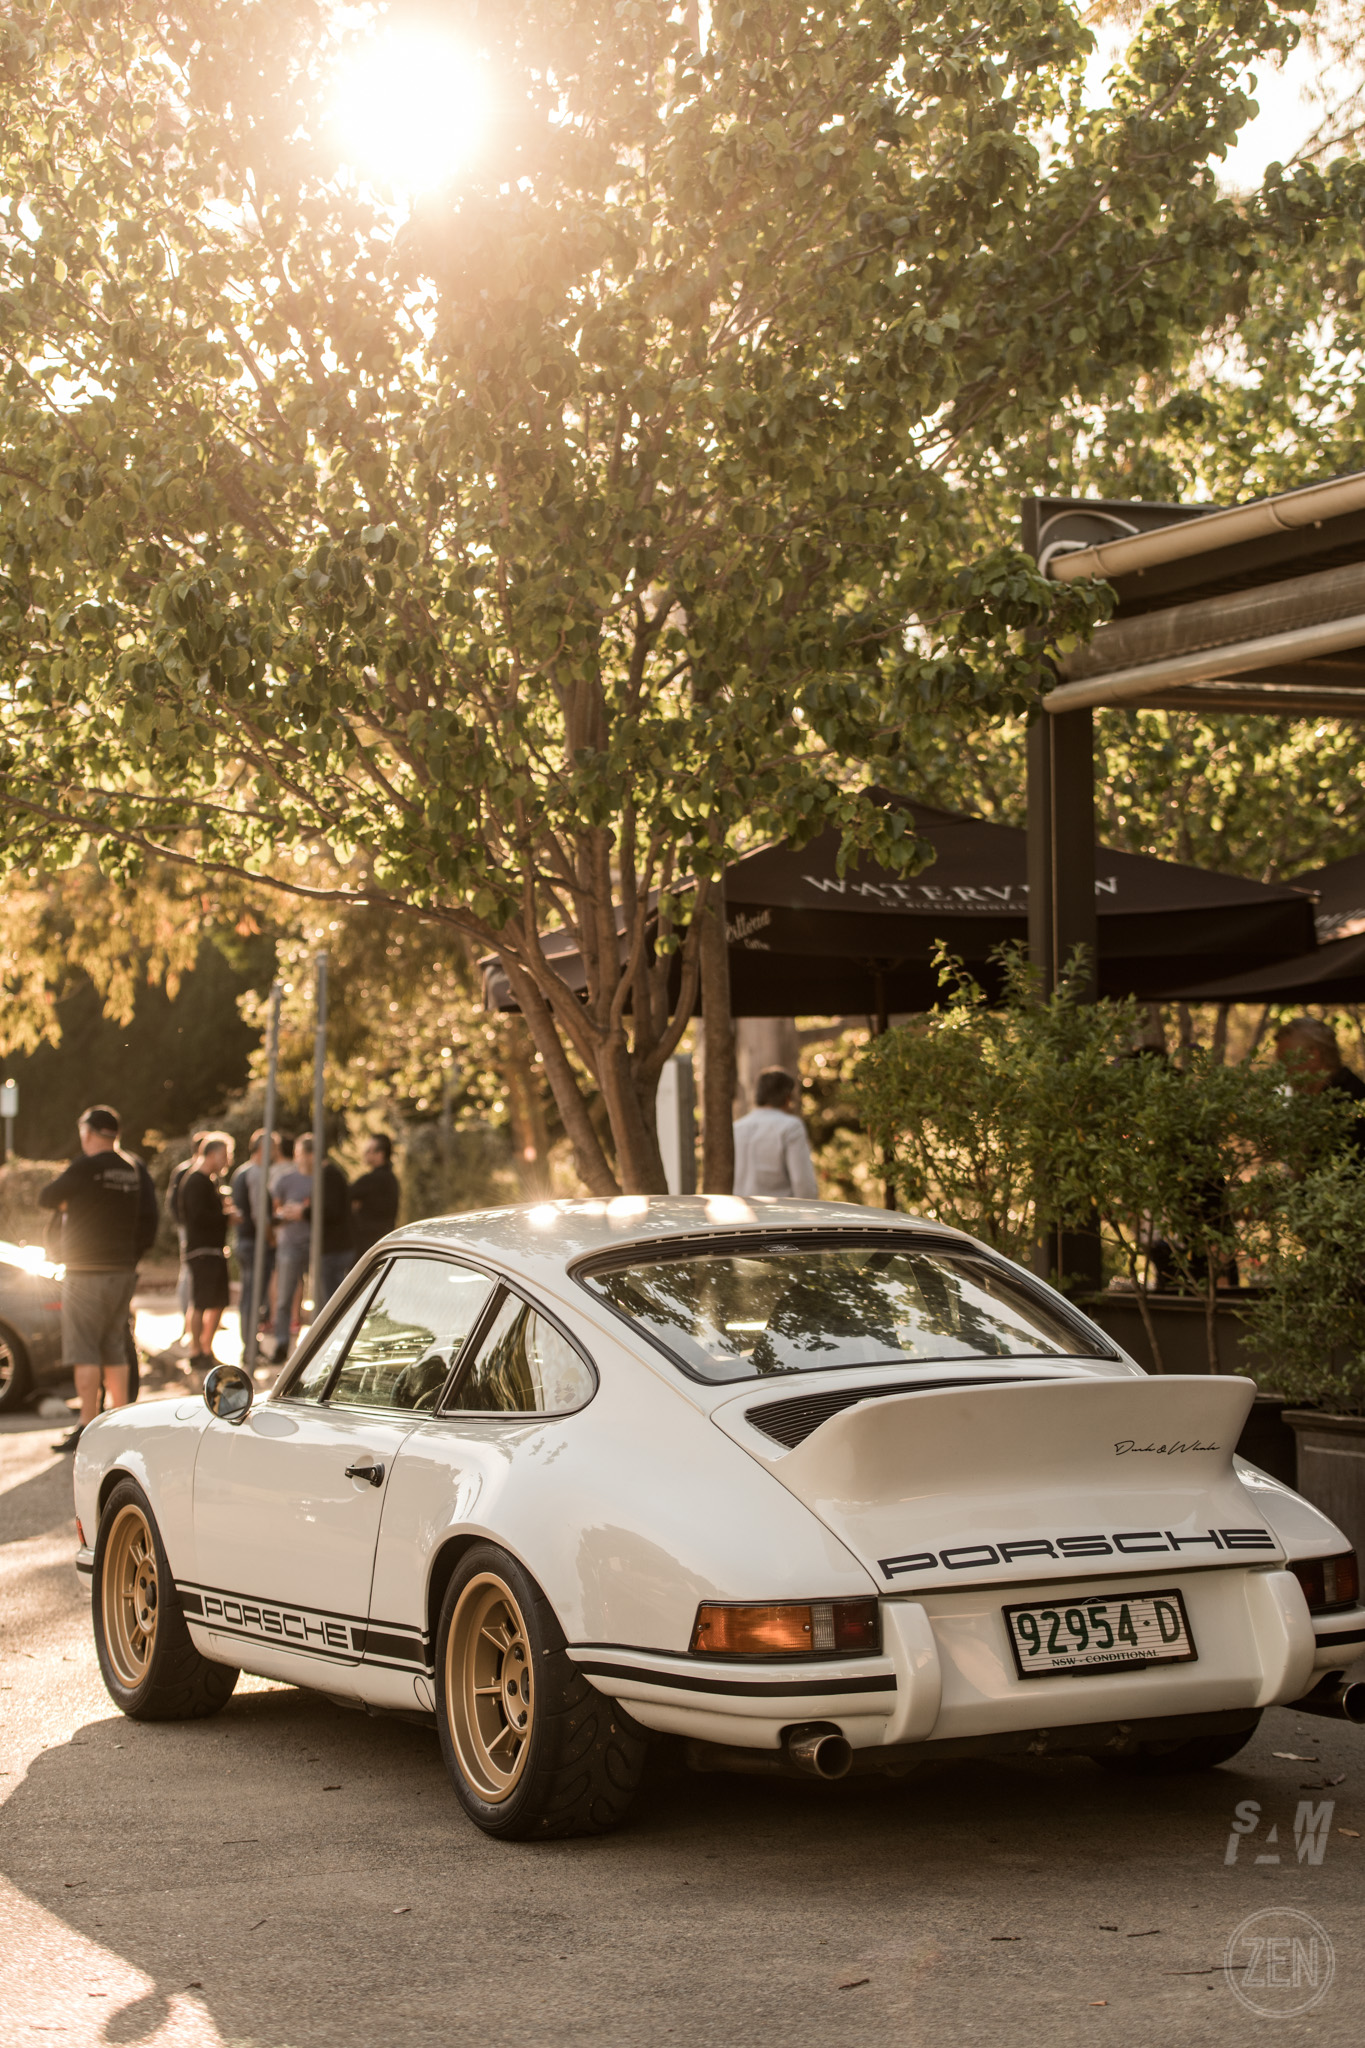 2019-10-27 - Autohaus Porsches & Coffee 061